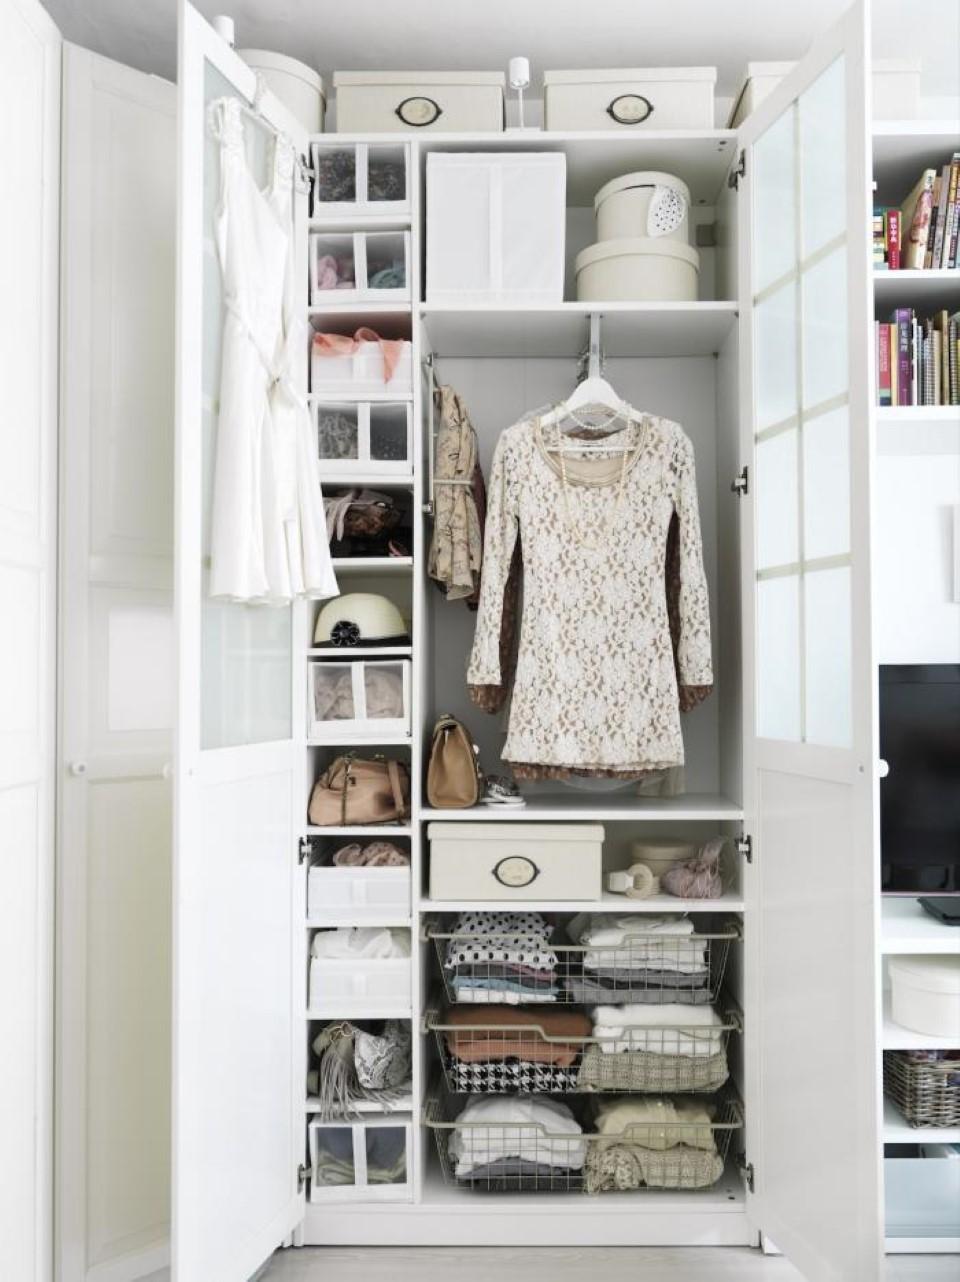 20 Shabby Chic Style Closet Design Ideas Decoration Love